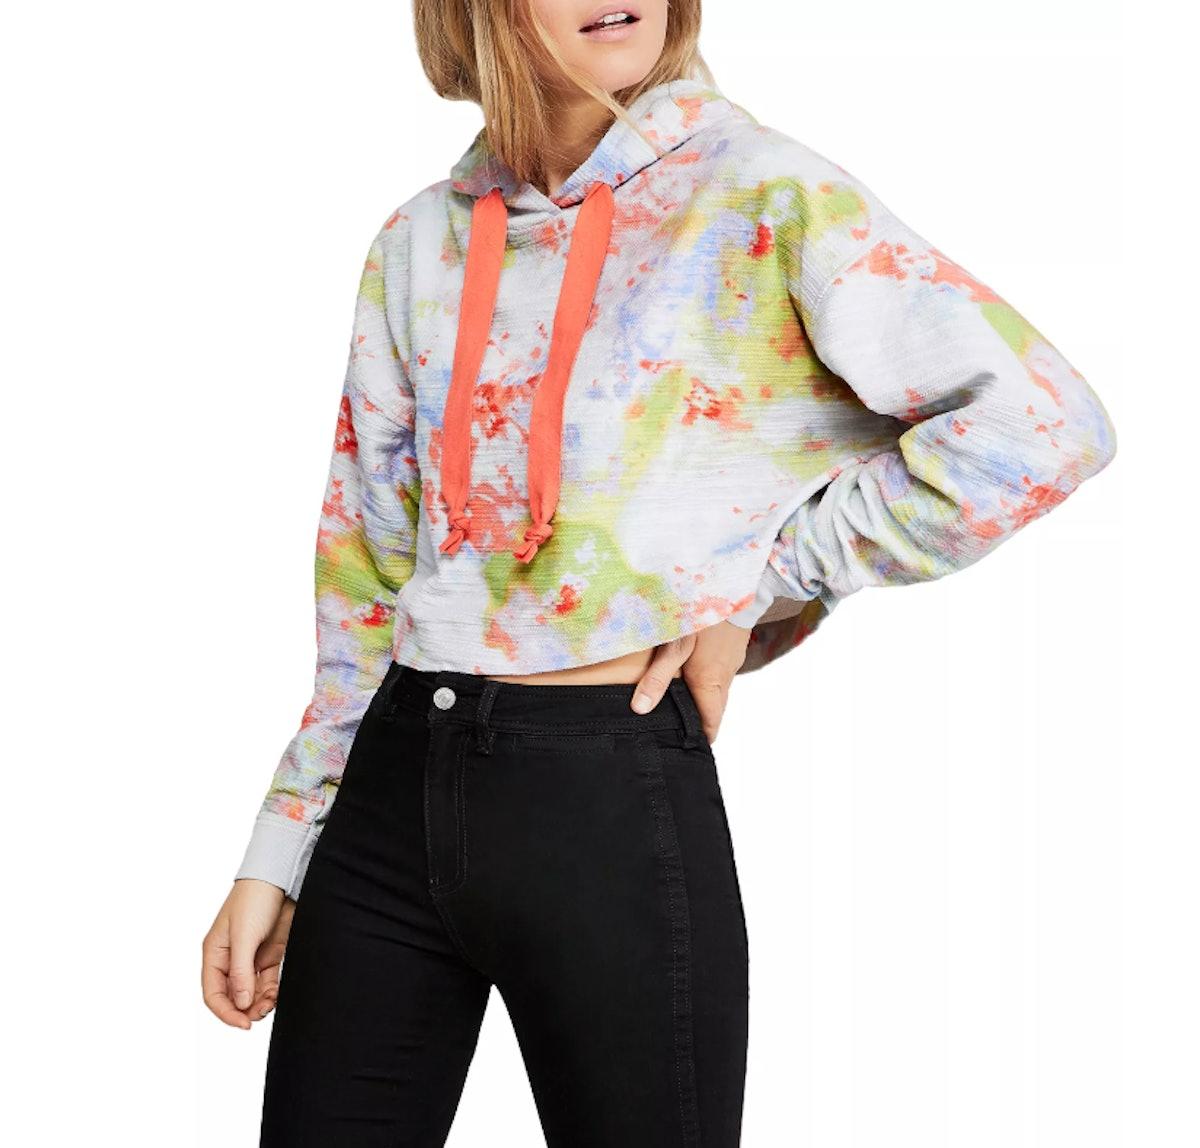 Free People Thinkin About You Tie-Dye Cropped Sweatshirt